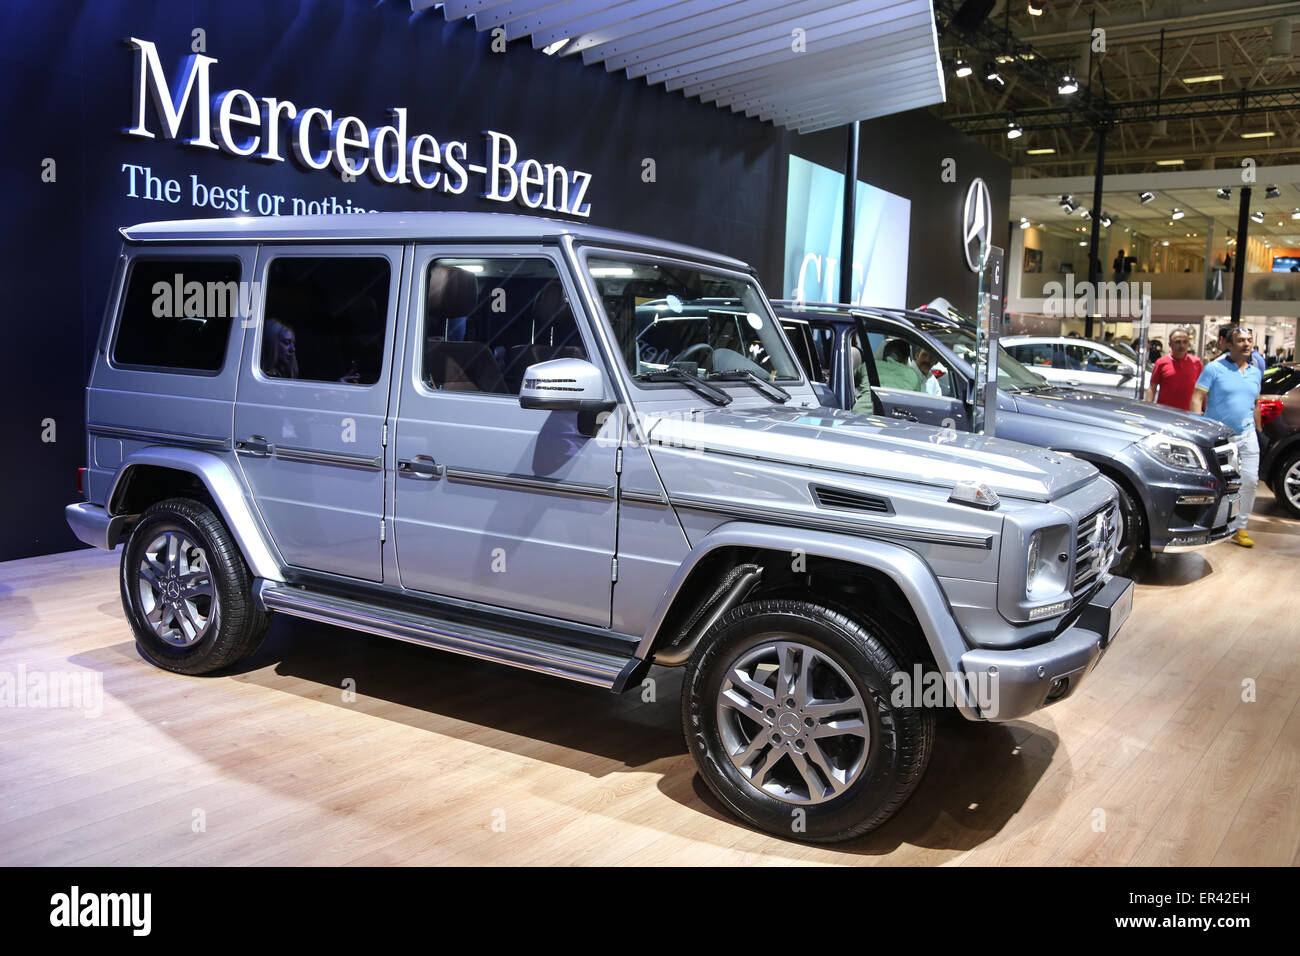 Istanbul turkey may 21 2015 mercedes benz g class car for Mercedes benz turkey